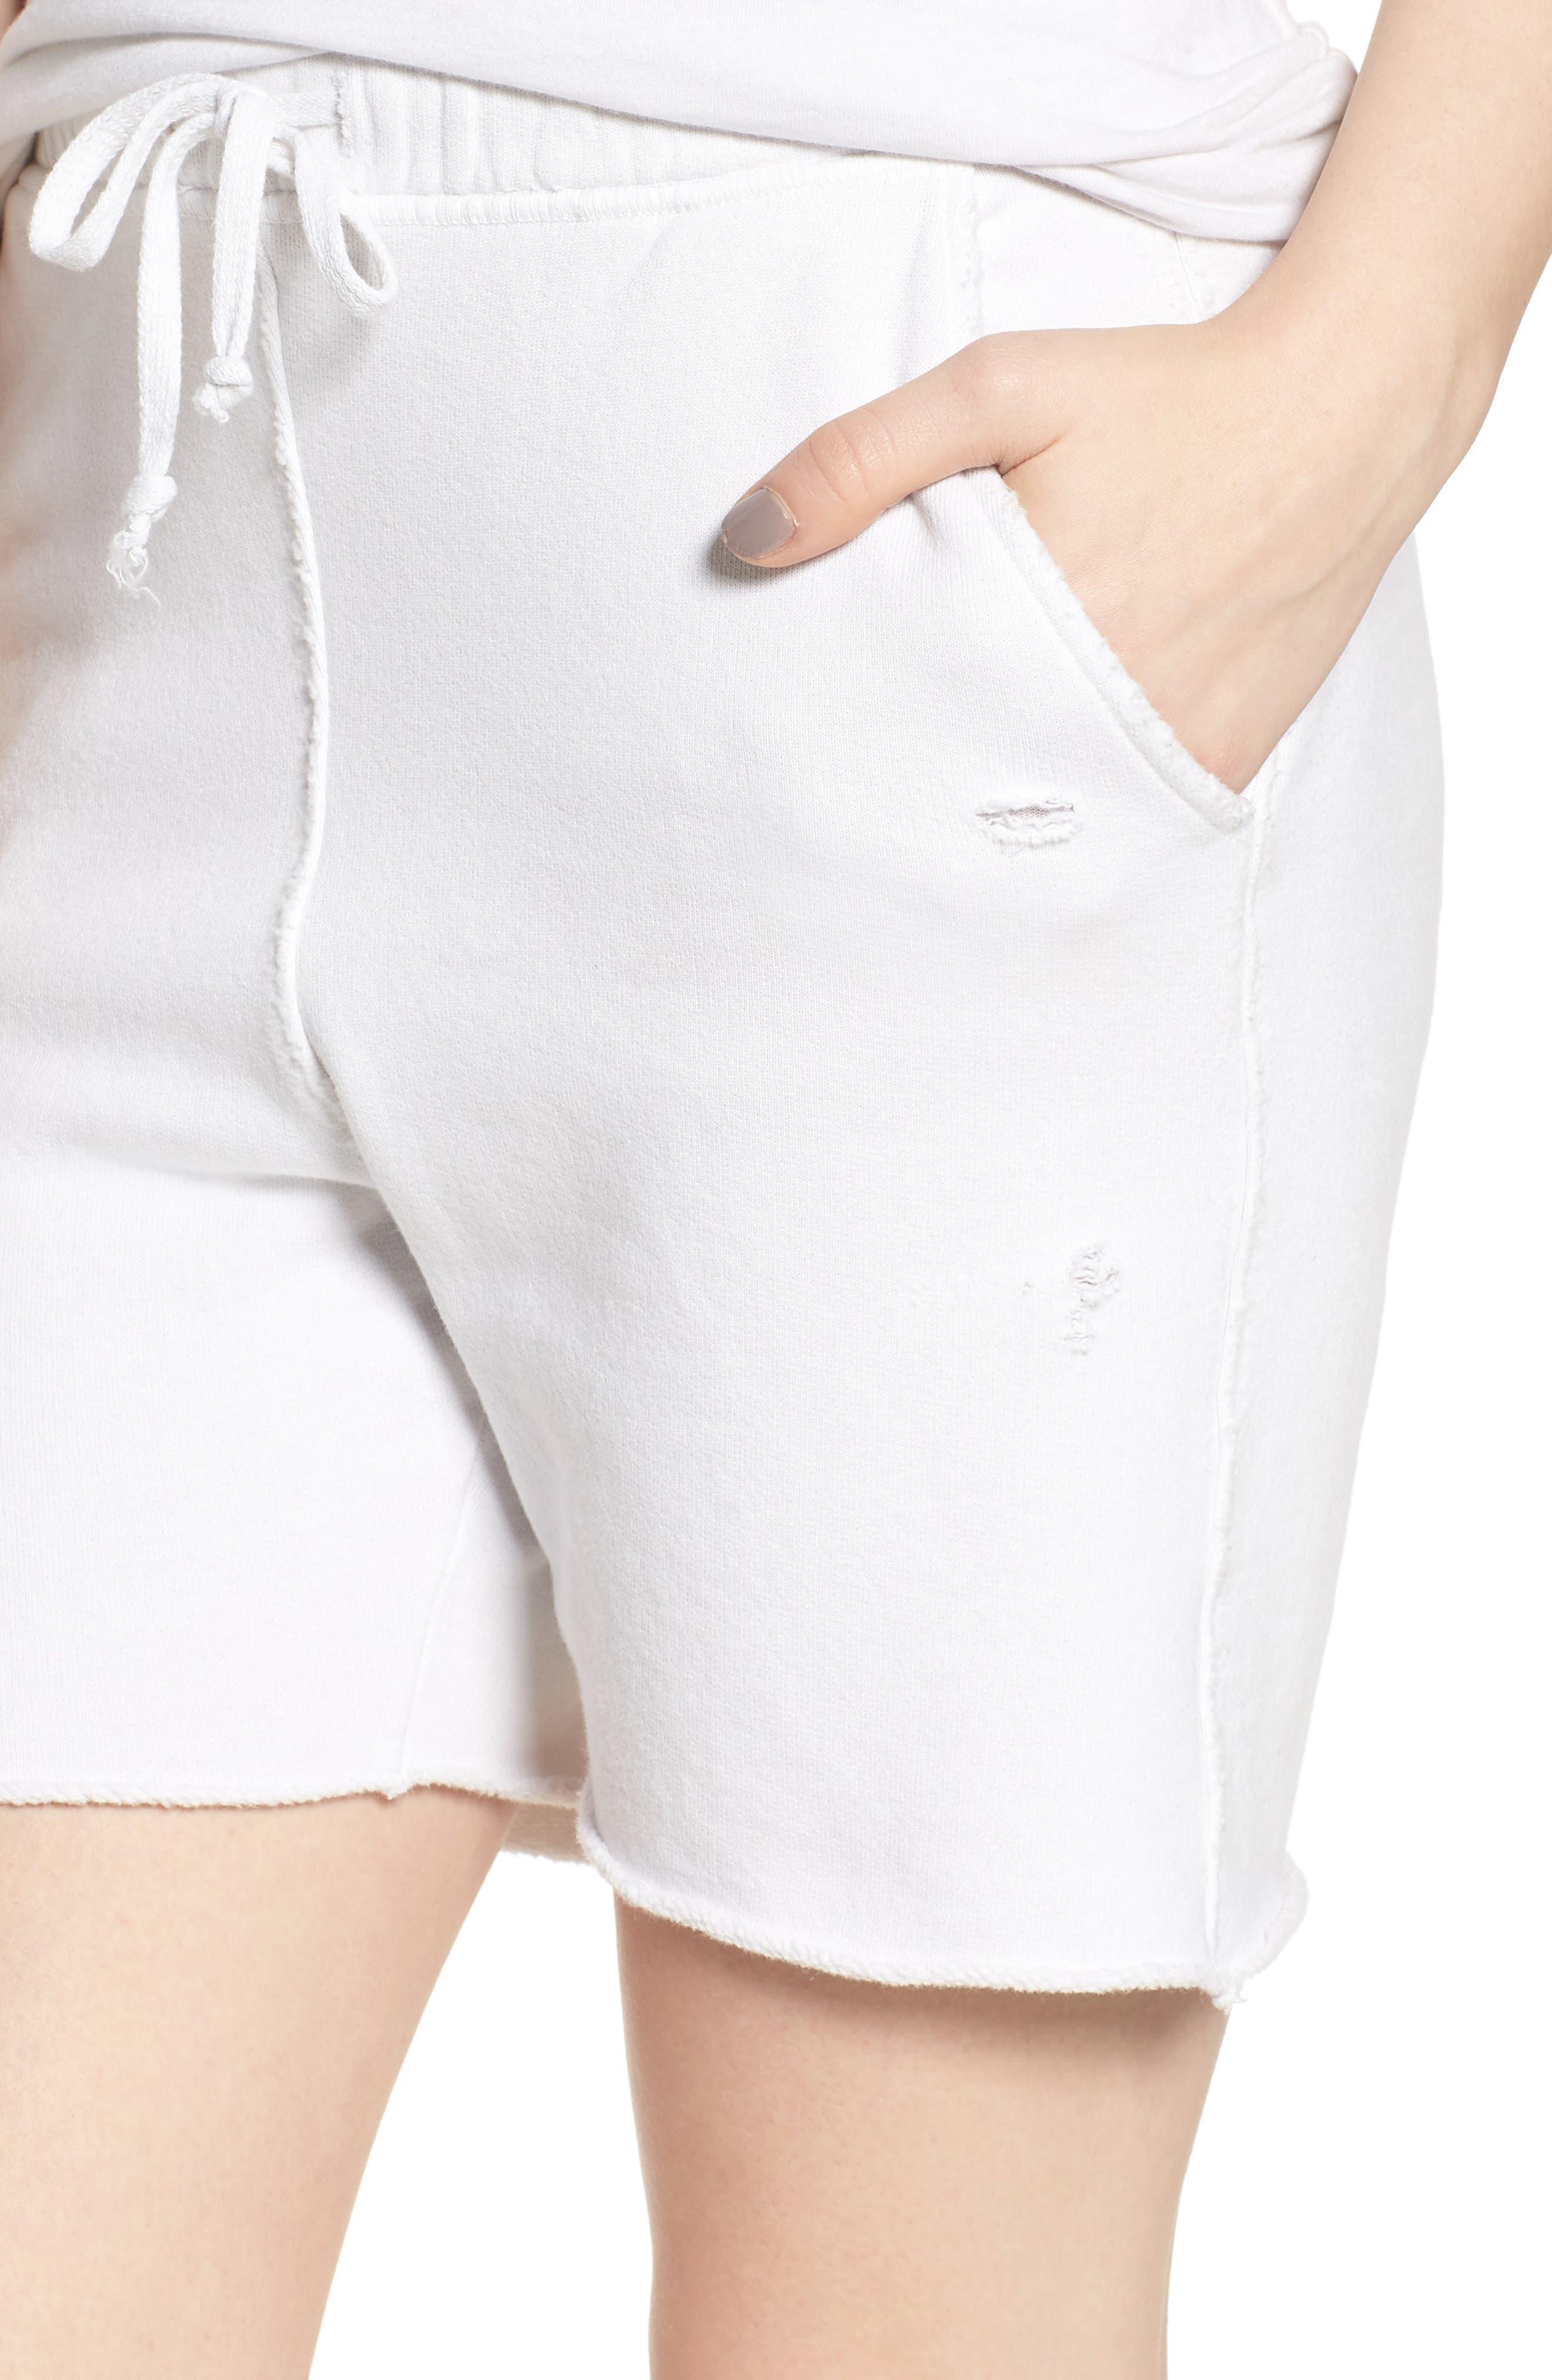 Fleece Shorts,                             Alternate thumbnail 4, color,                             Dirty White 10 Yr Vintage